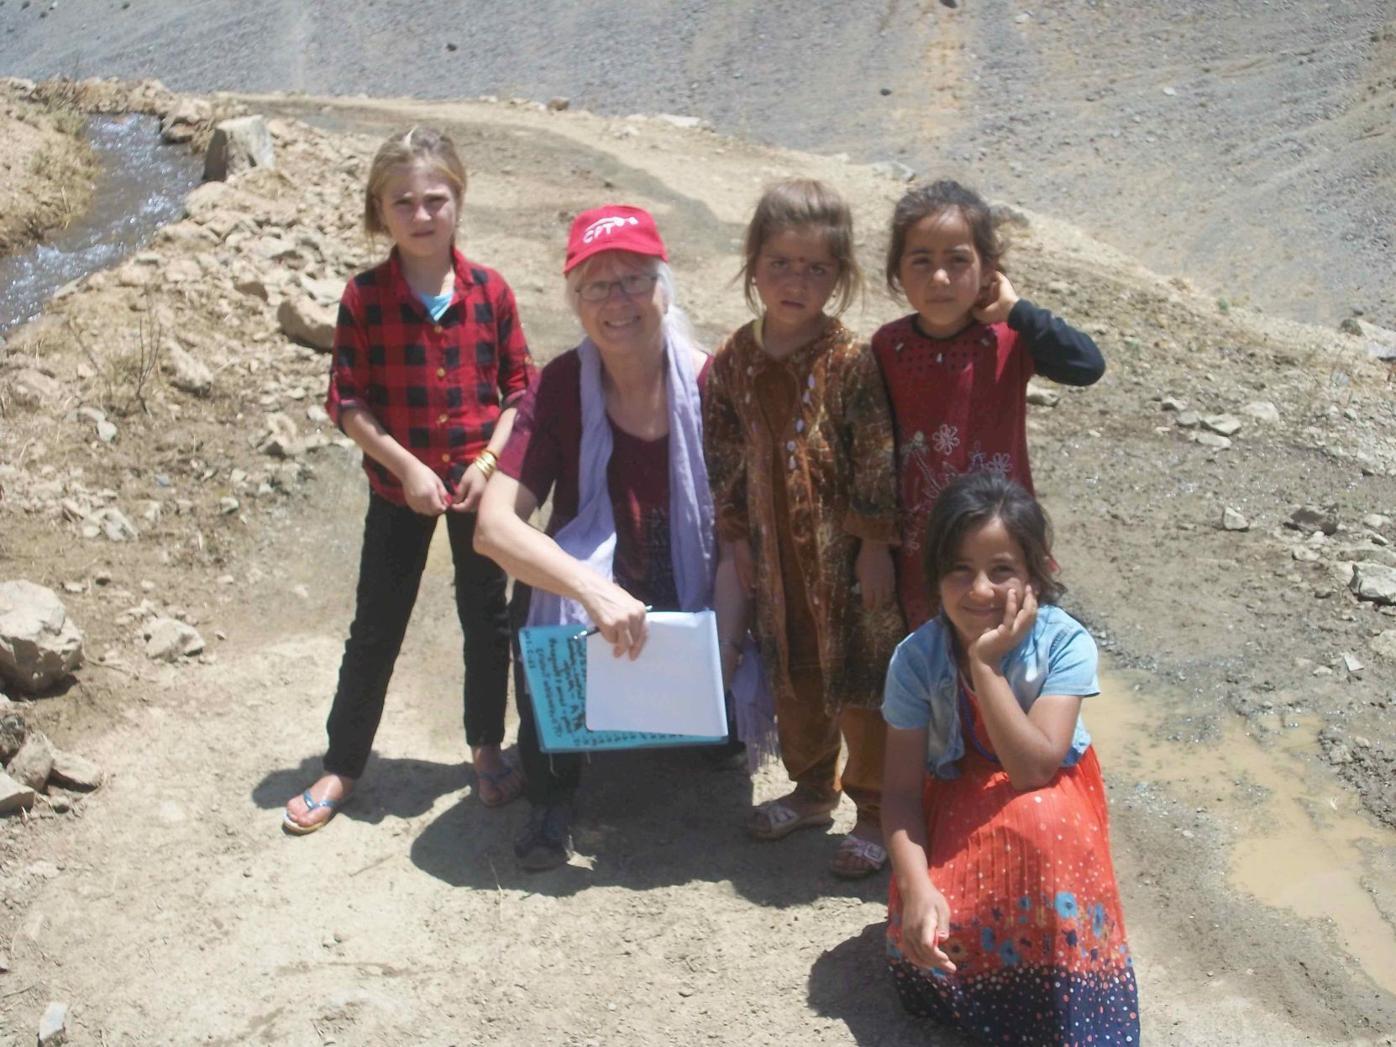 Peggy Gish in Iraq